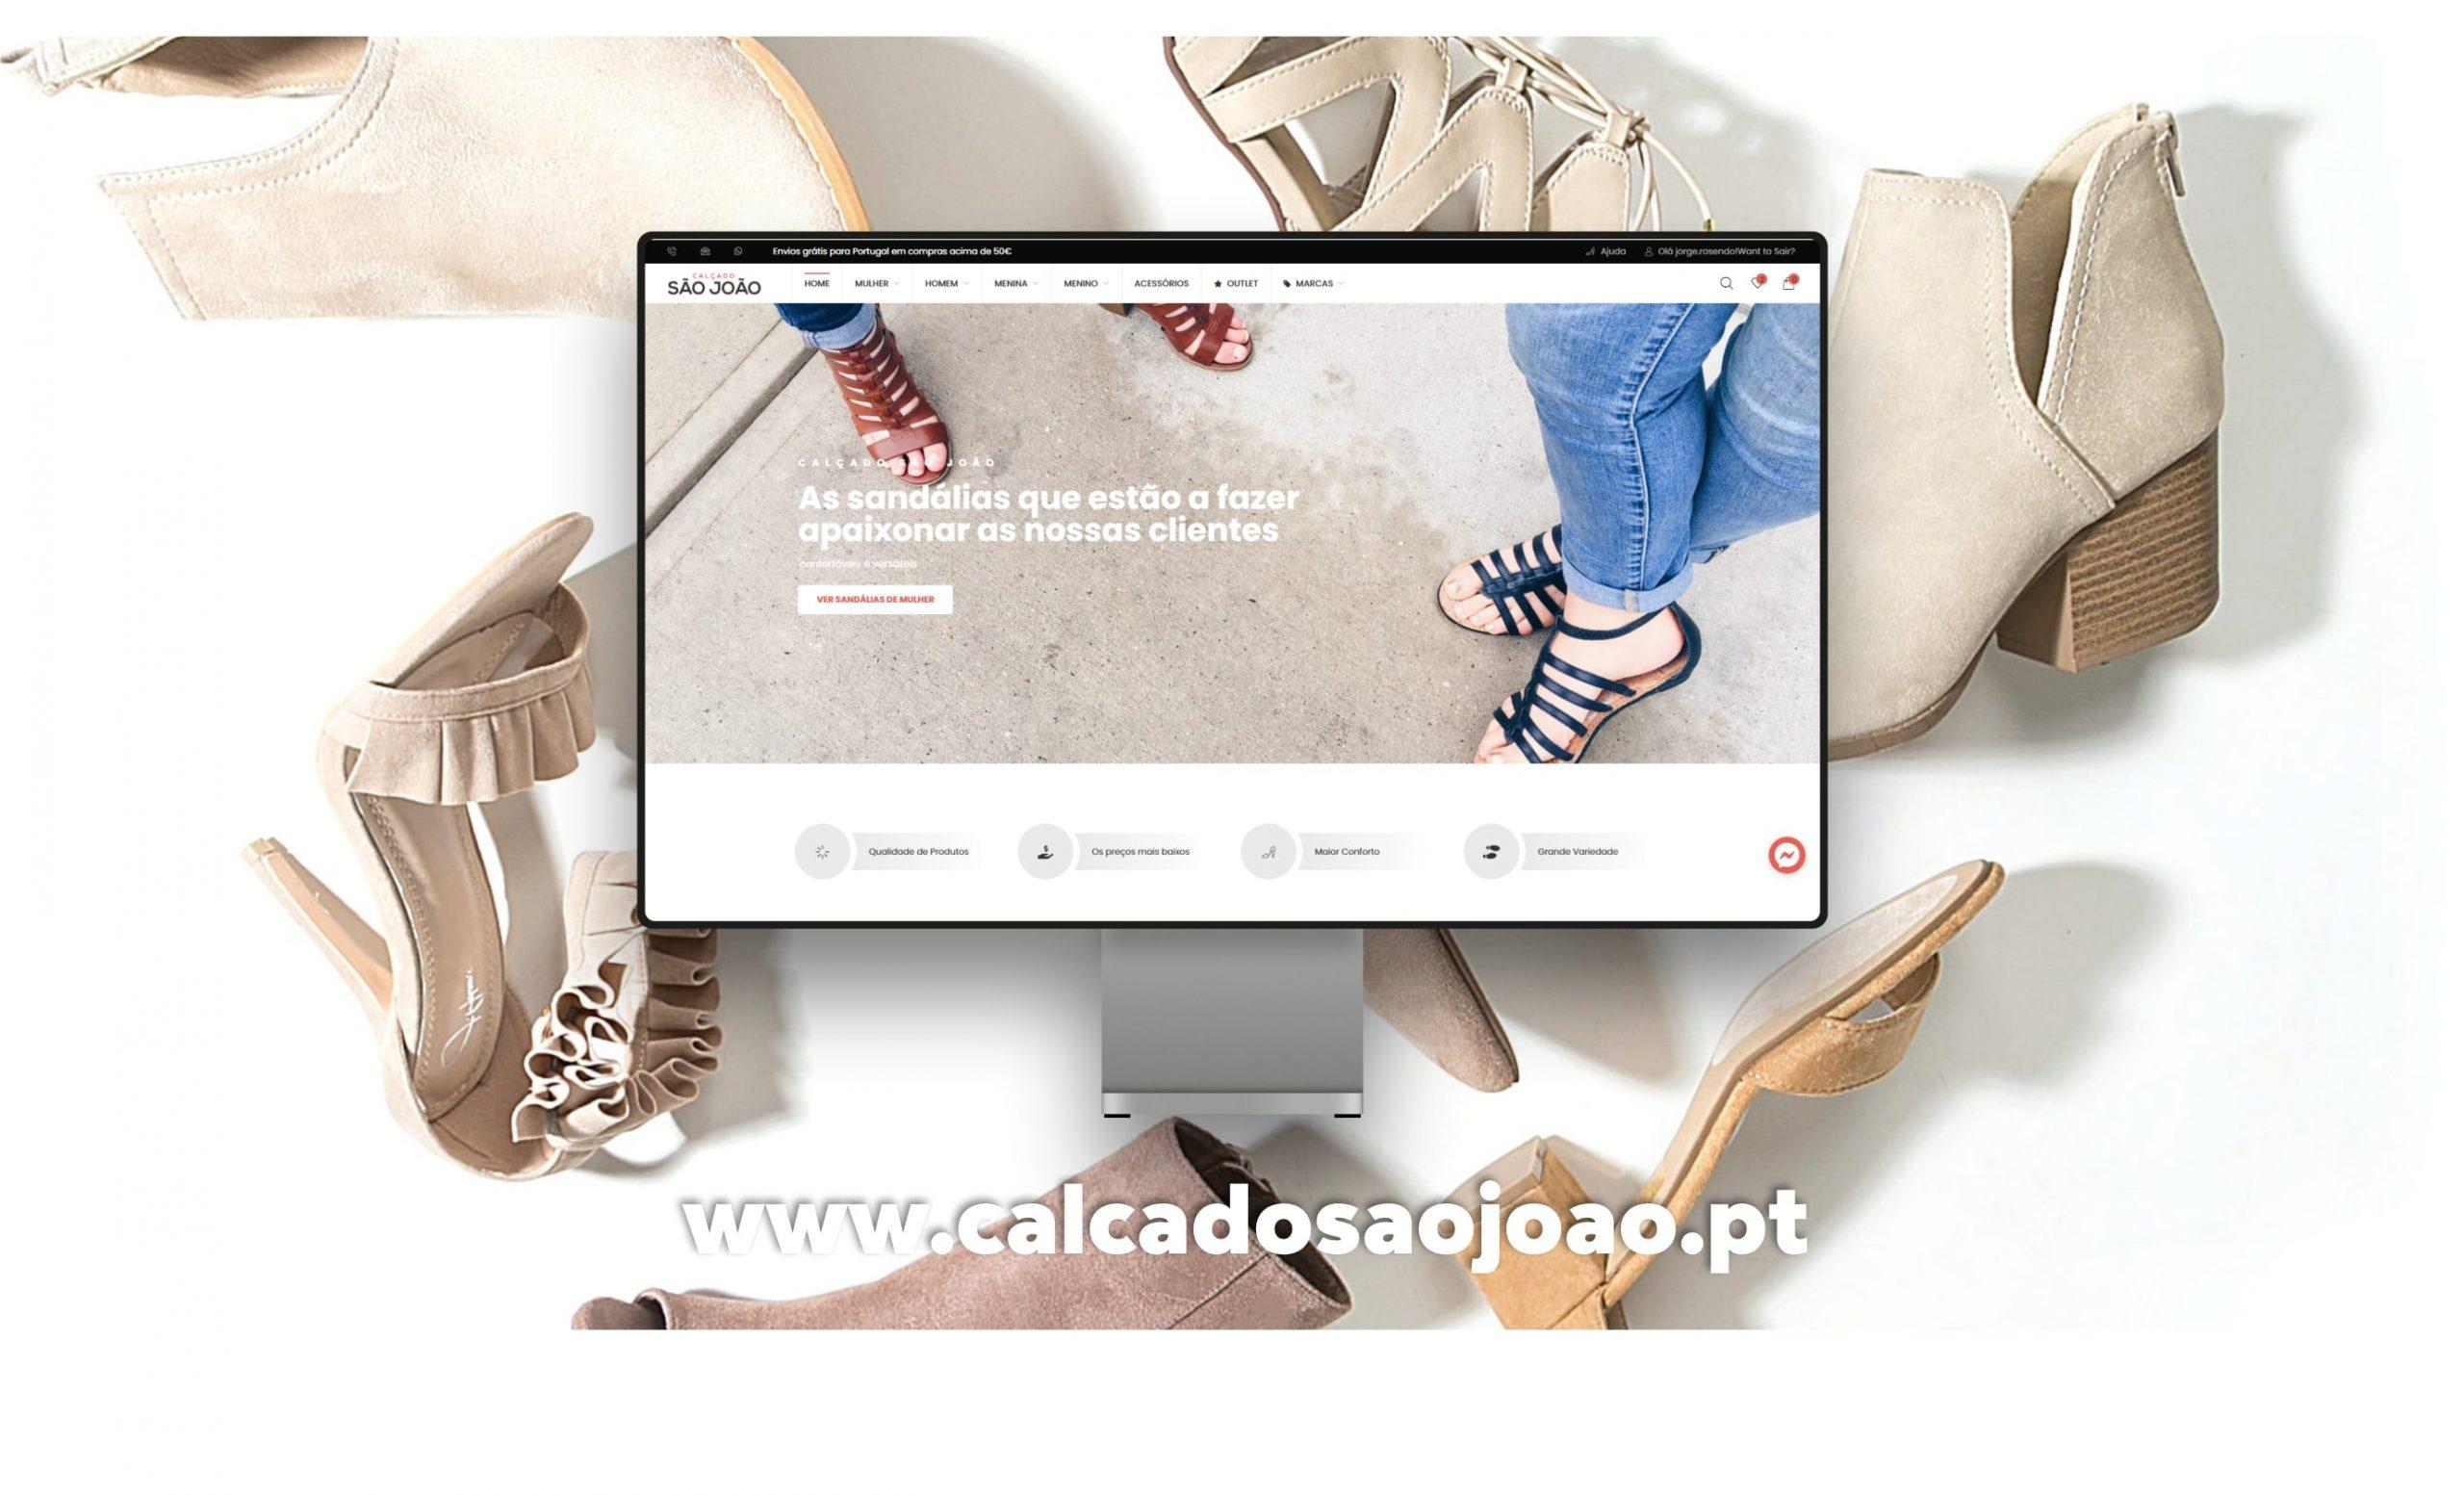 e-commerce-calcado-sao-joao-min